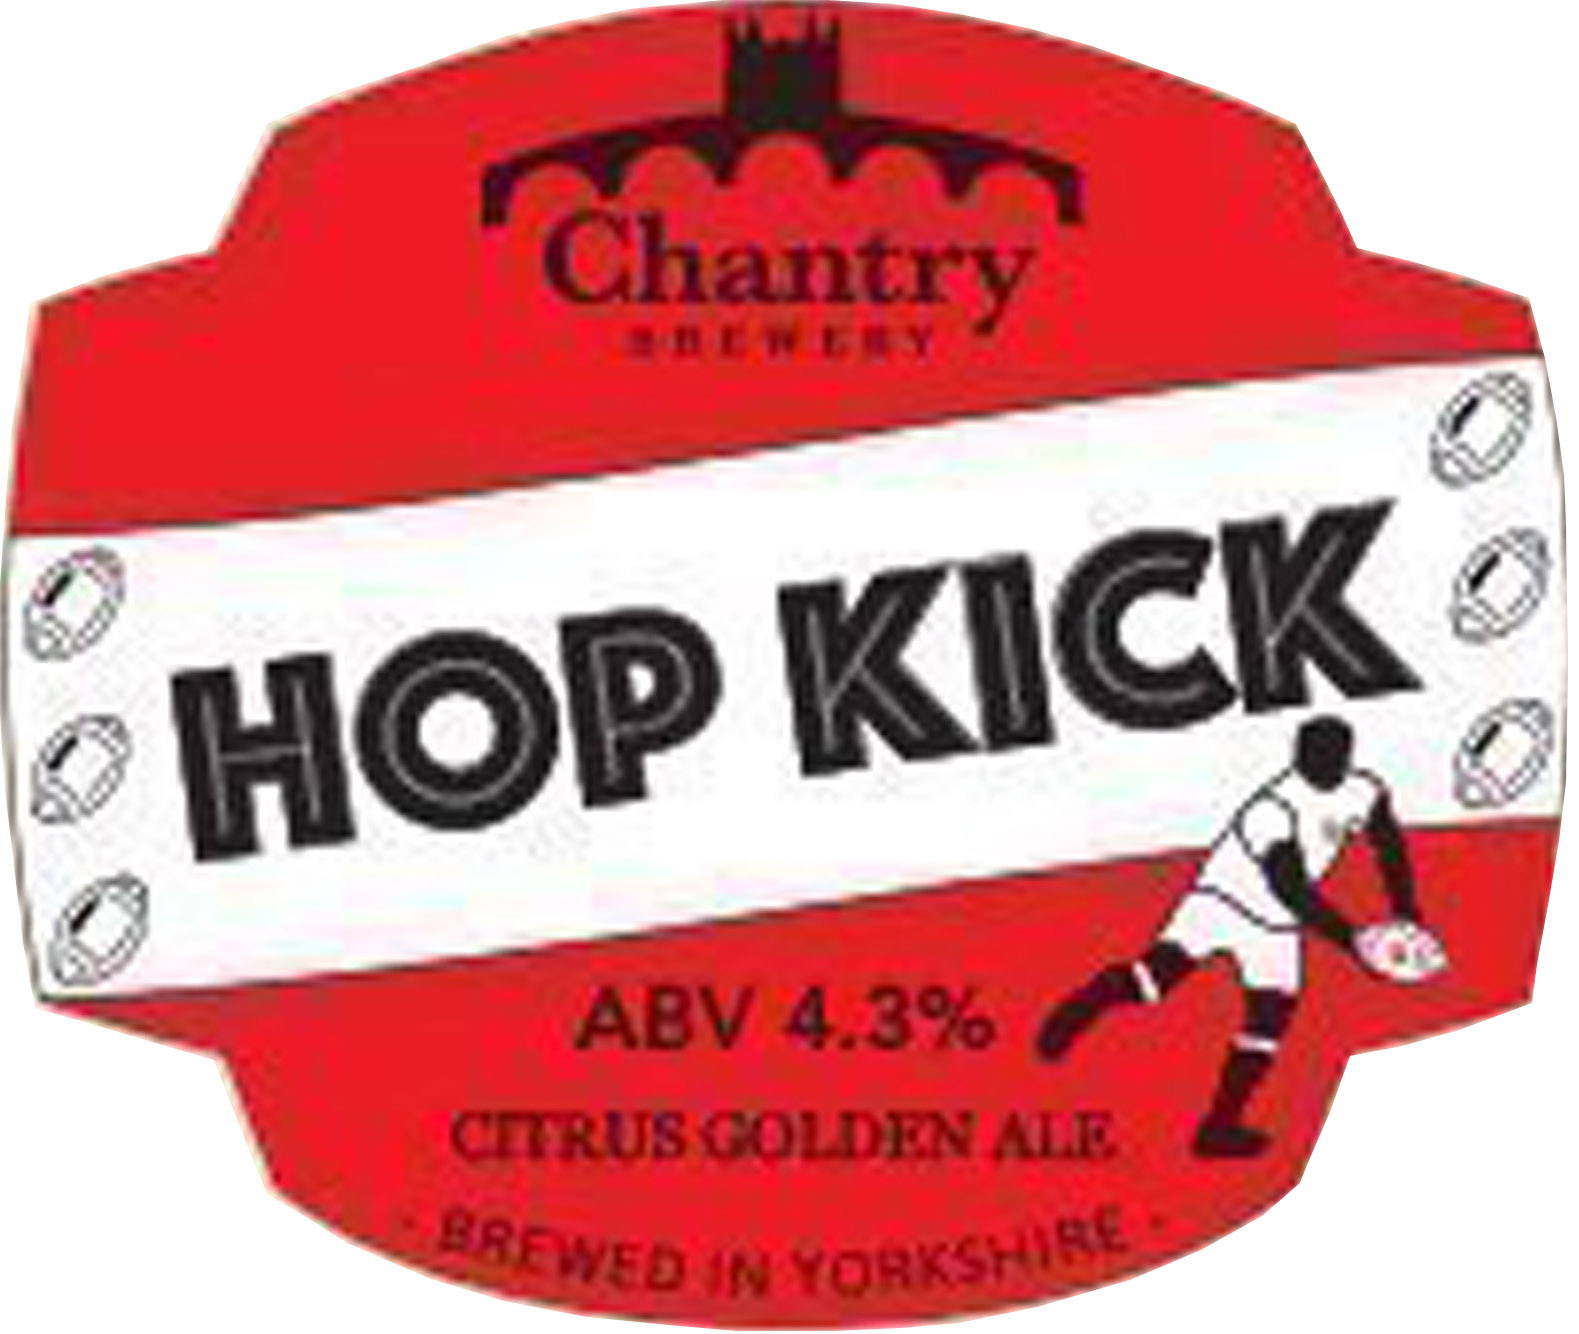 Chantry Brewery Hop Kick